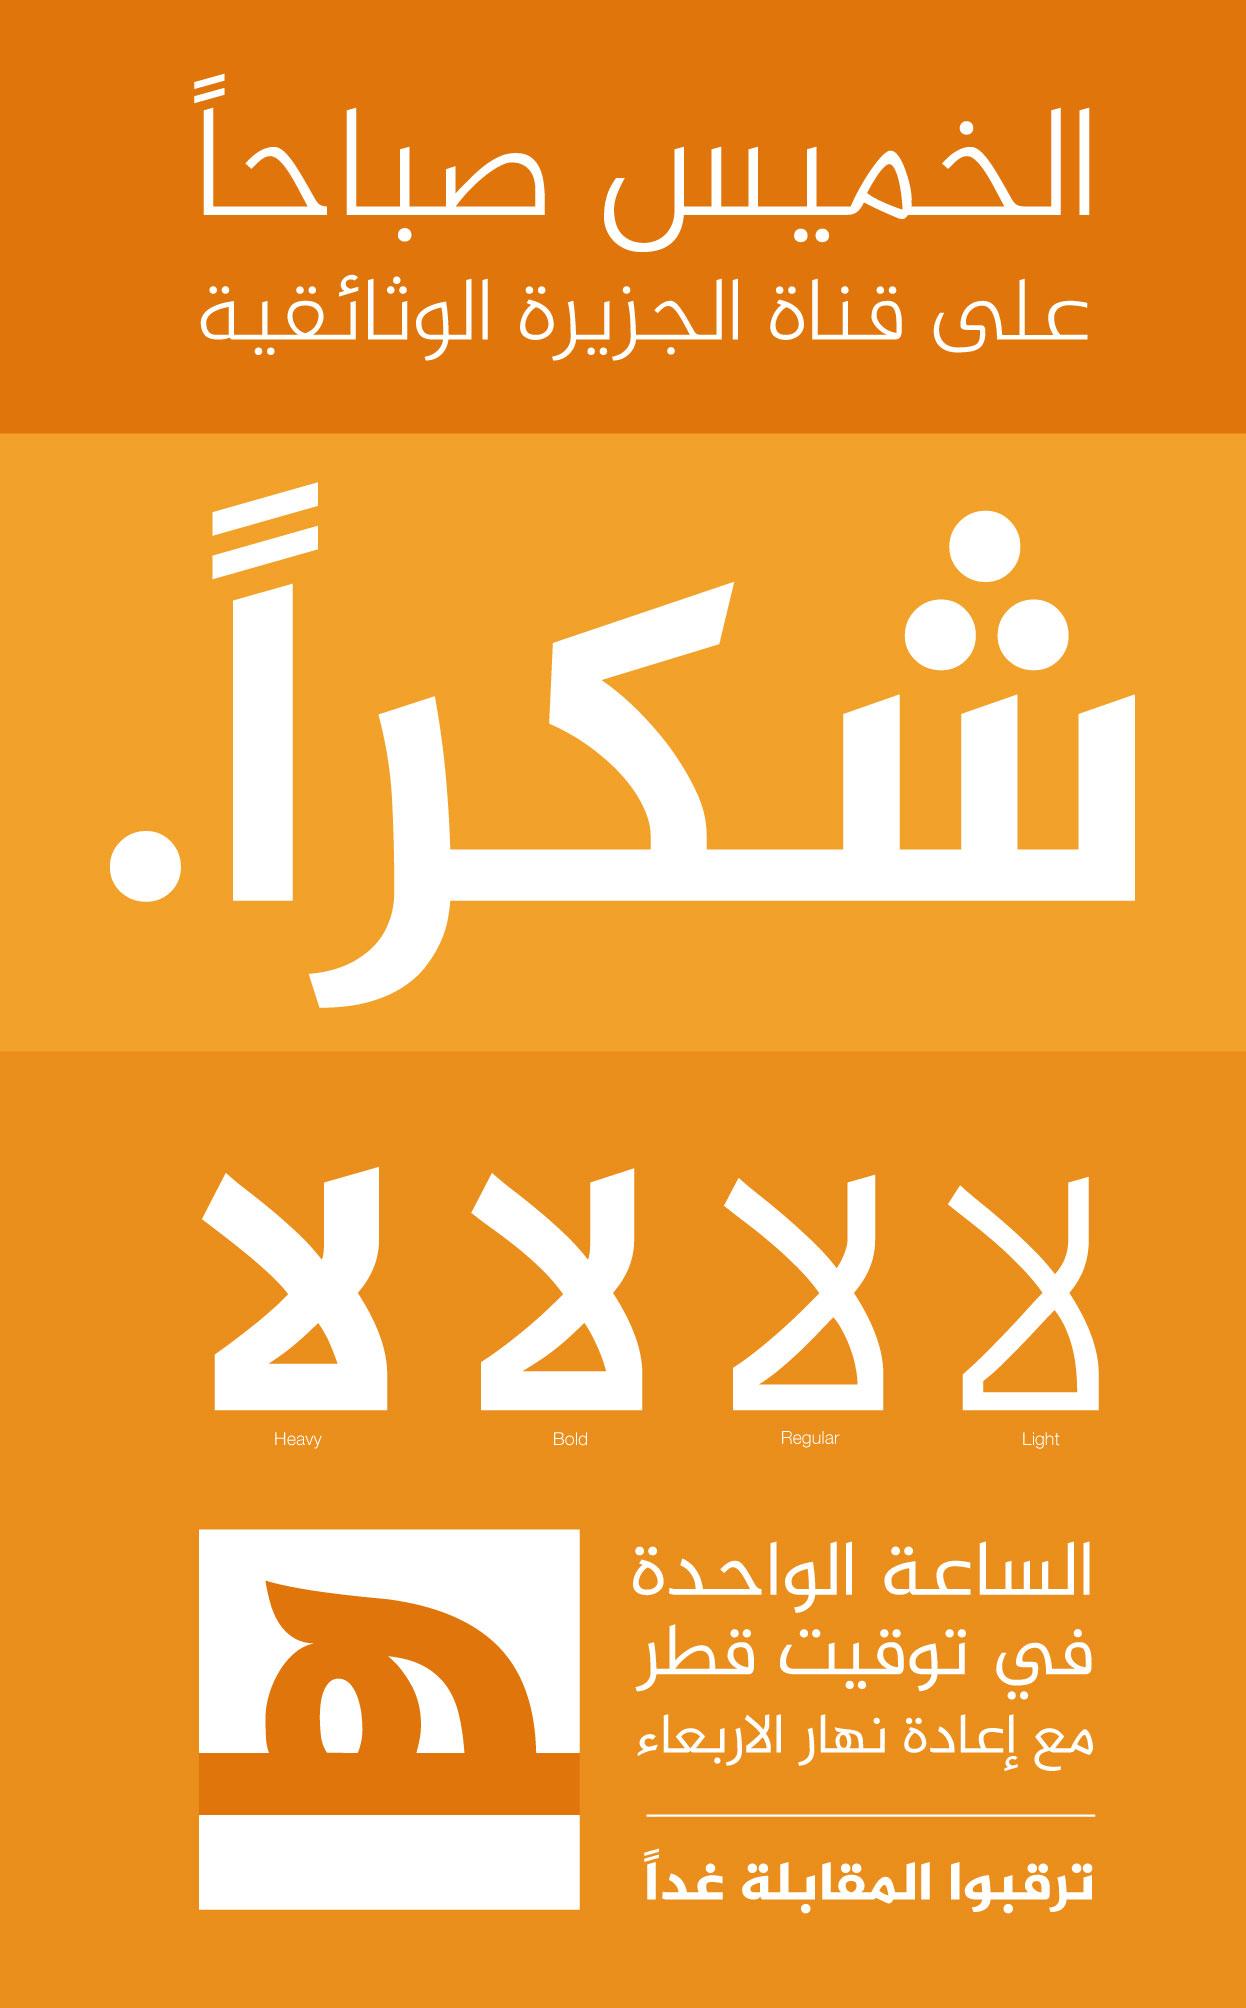 Al-Jazeera TV Font - خط قناة الجزيرة - Arabic Typography